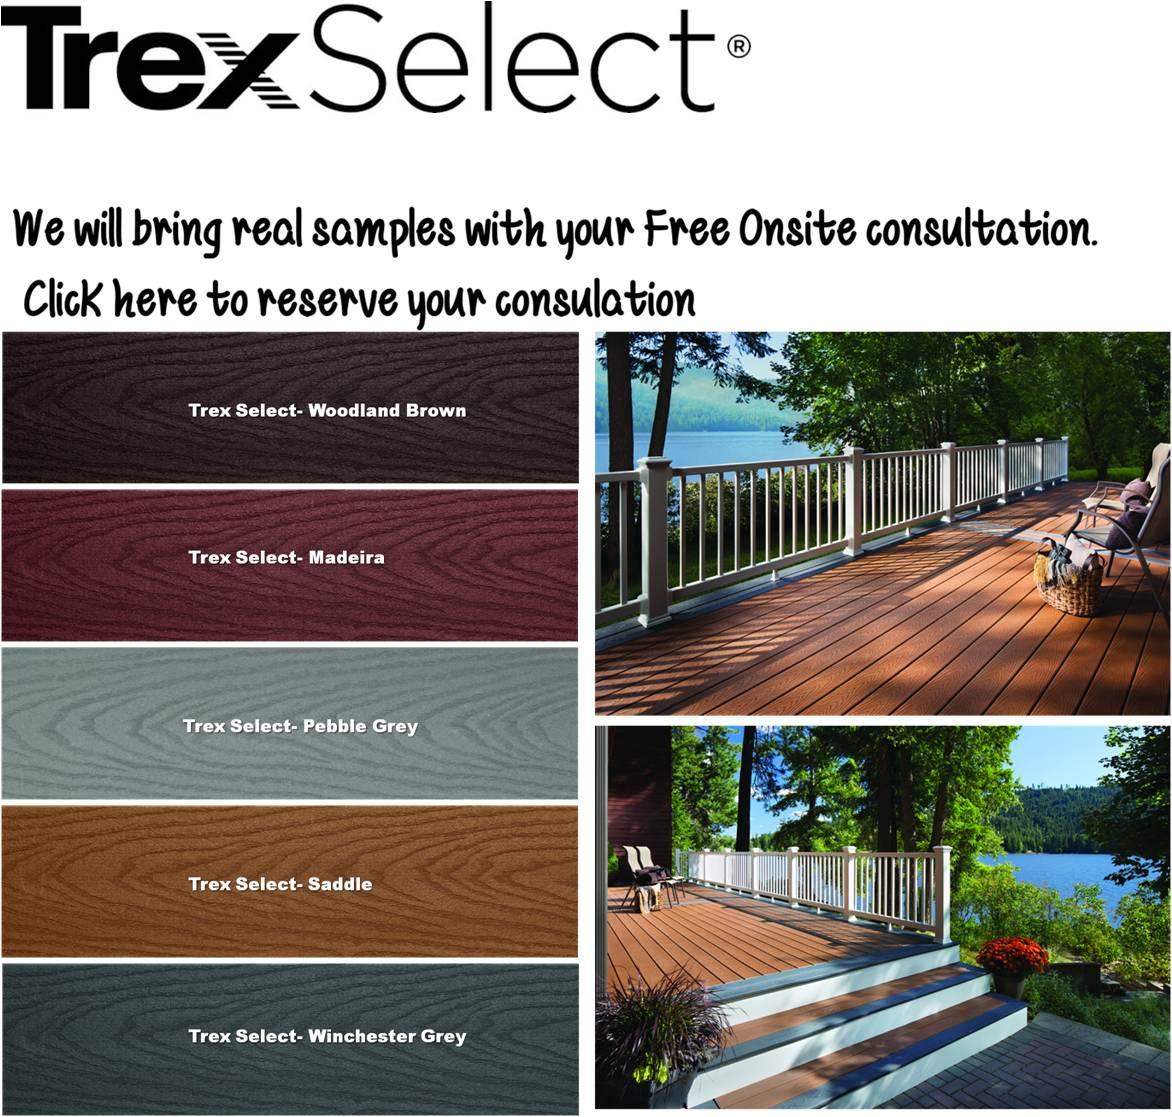 Trex Decking Colors >> Trex Decks-MyDeck.ca